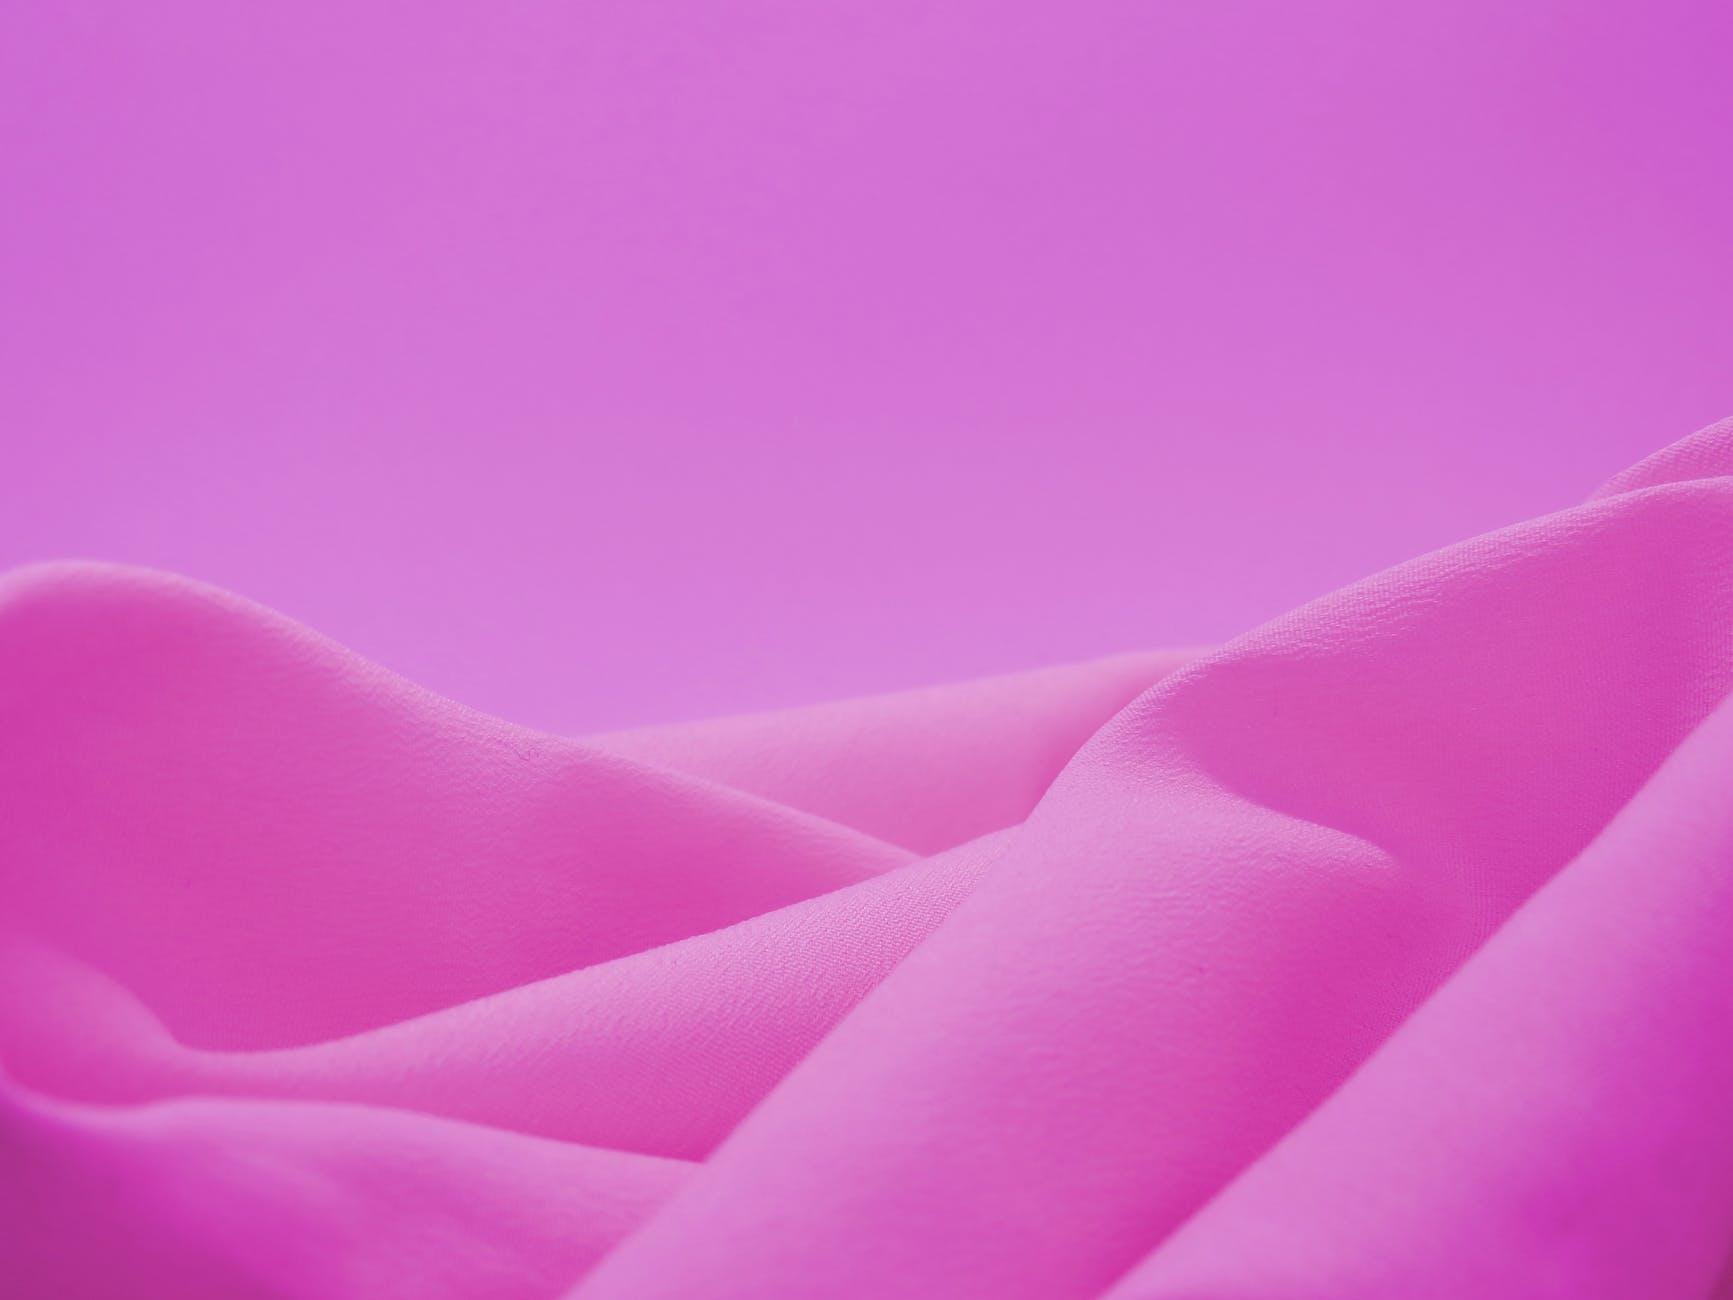 pink fabric romance texture background